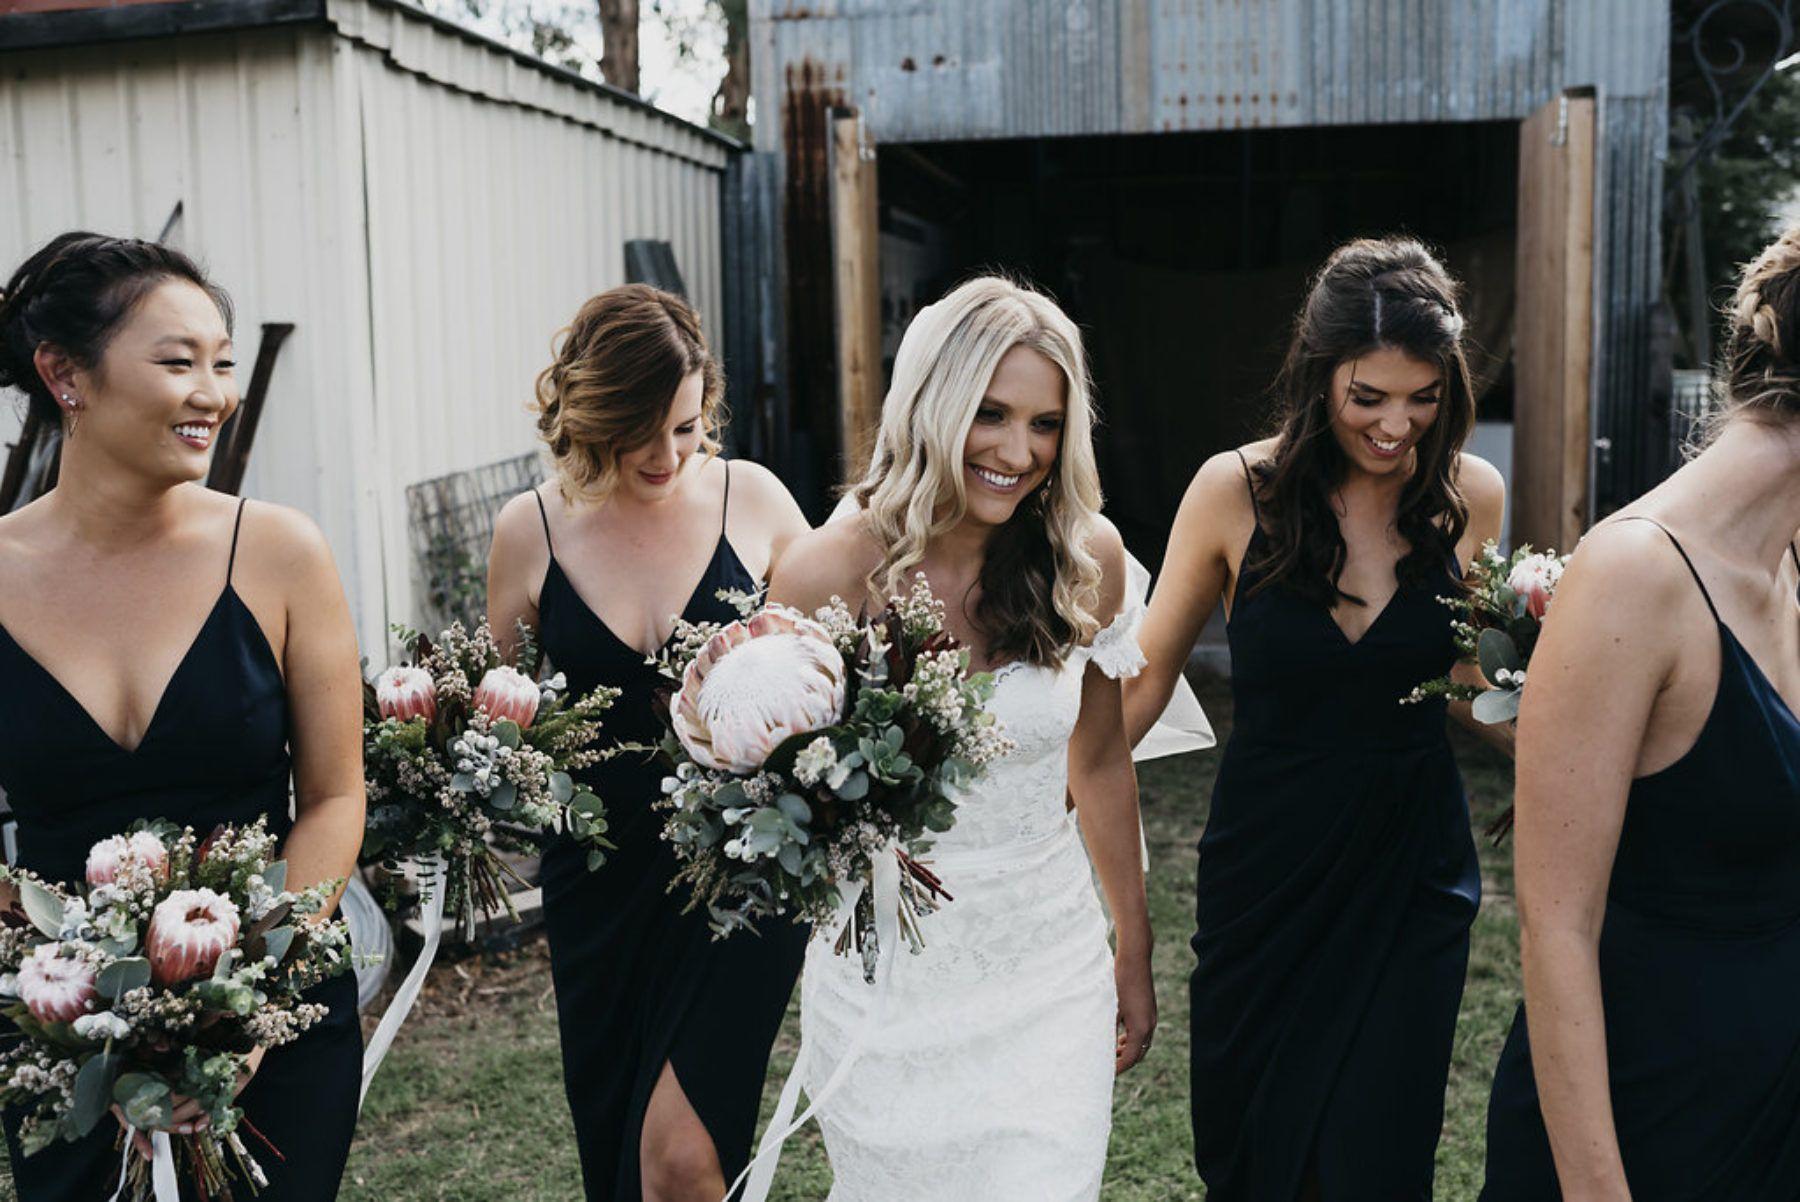 Black bridesmaid dresses by shona joy bridesmaids pinterest black bridesmaid dresses by shona joy ombrellifo Images